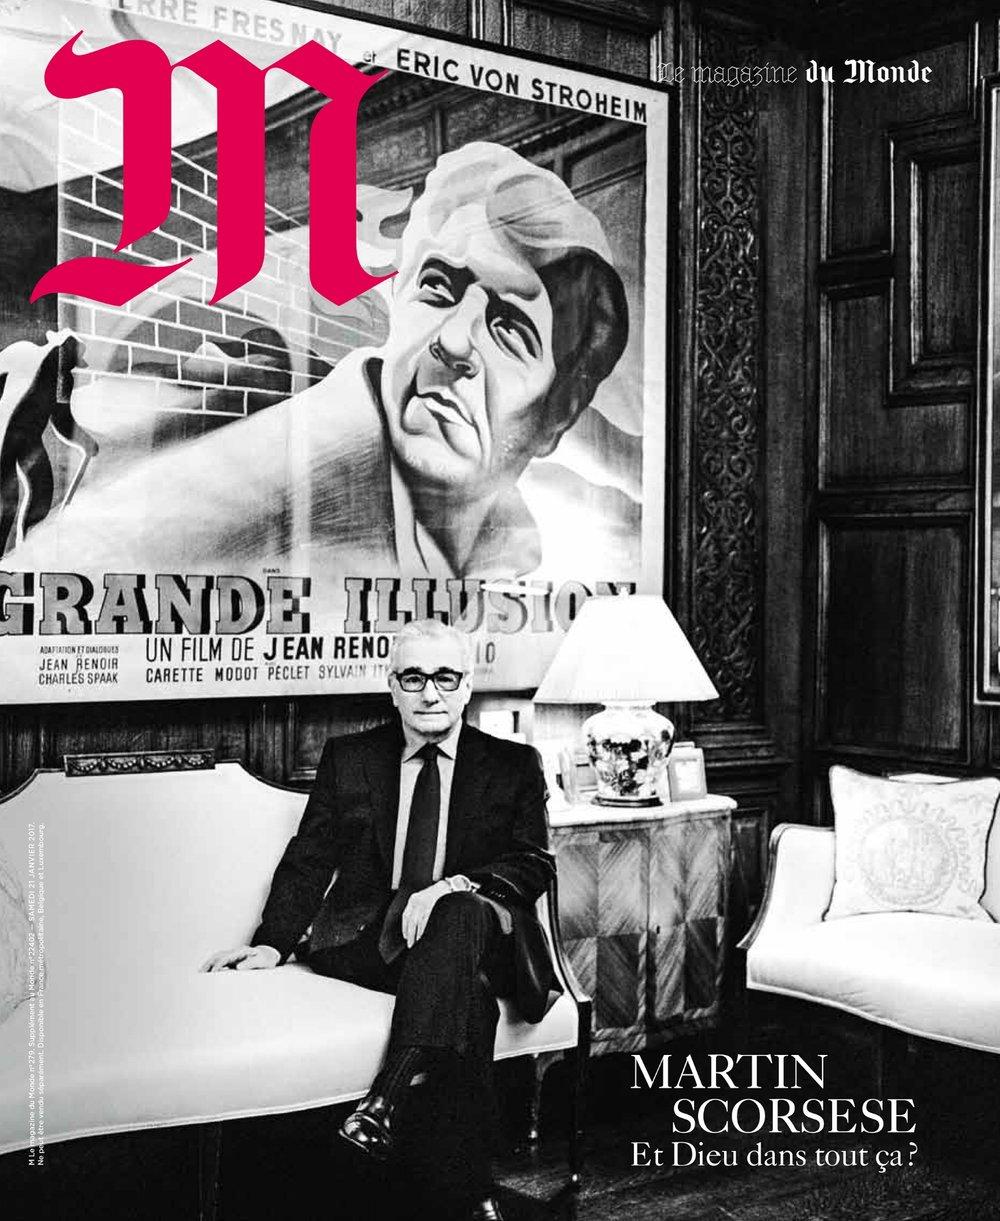 Martin Scorsese, New York